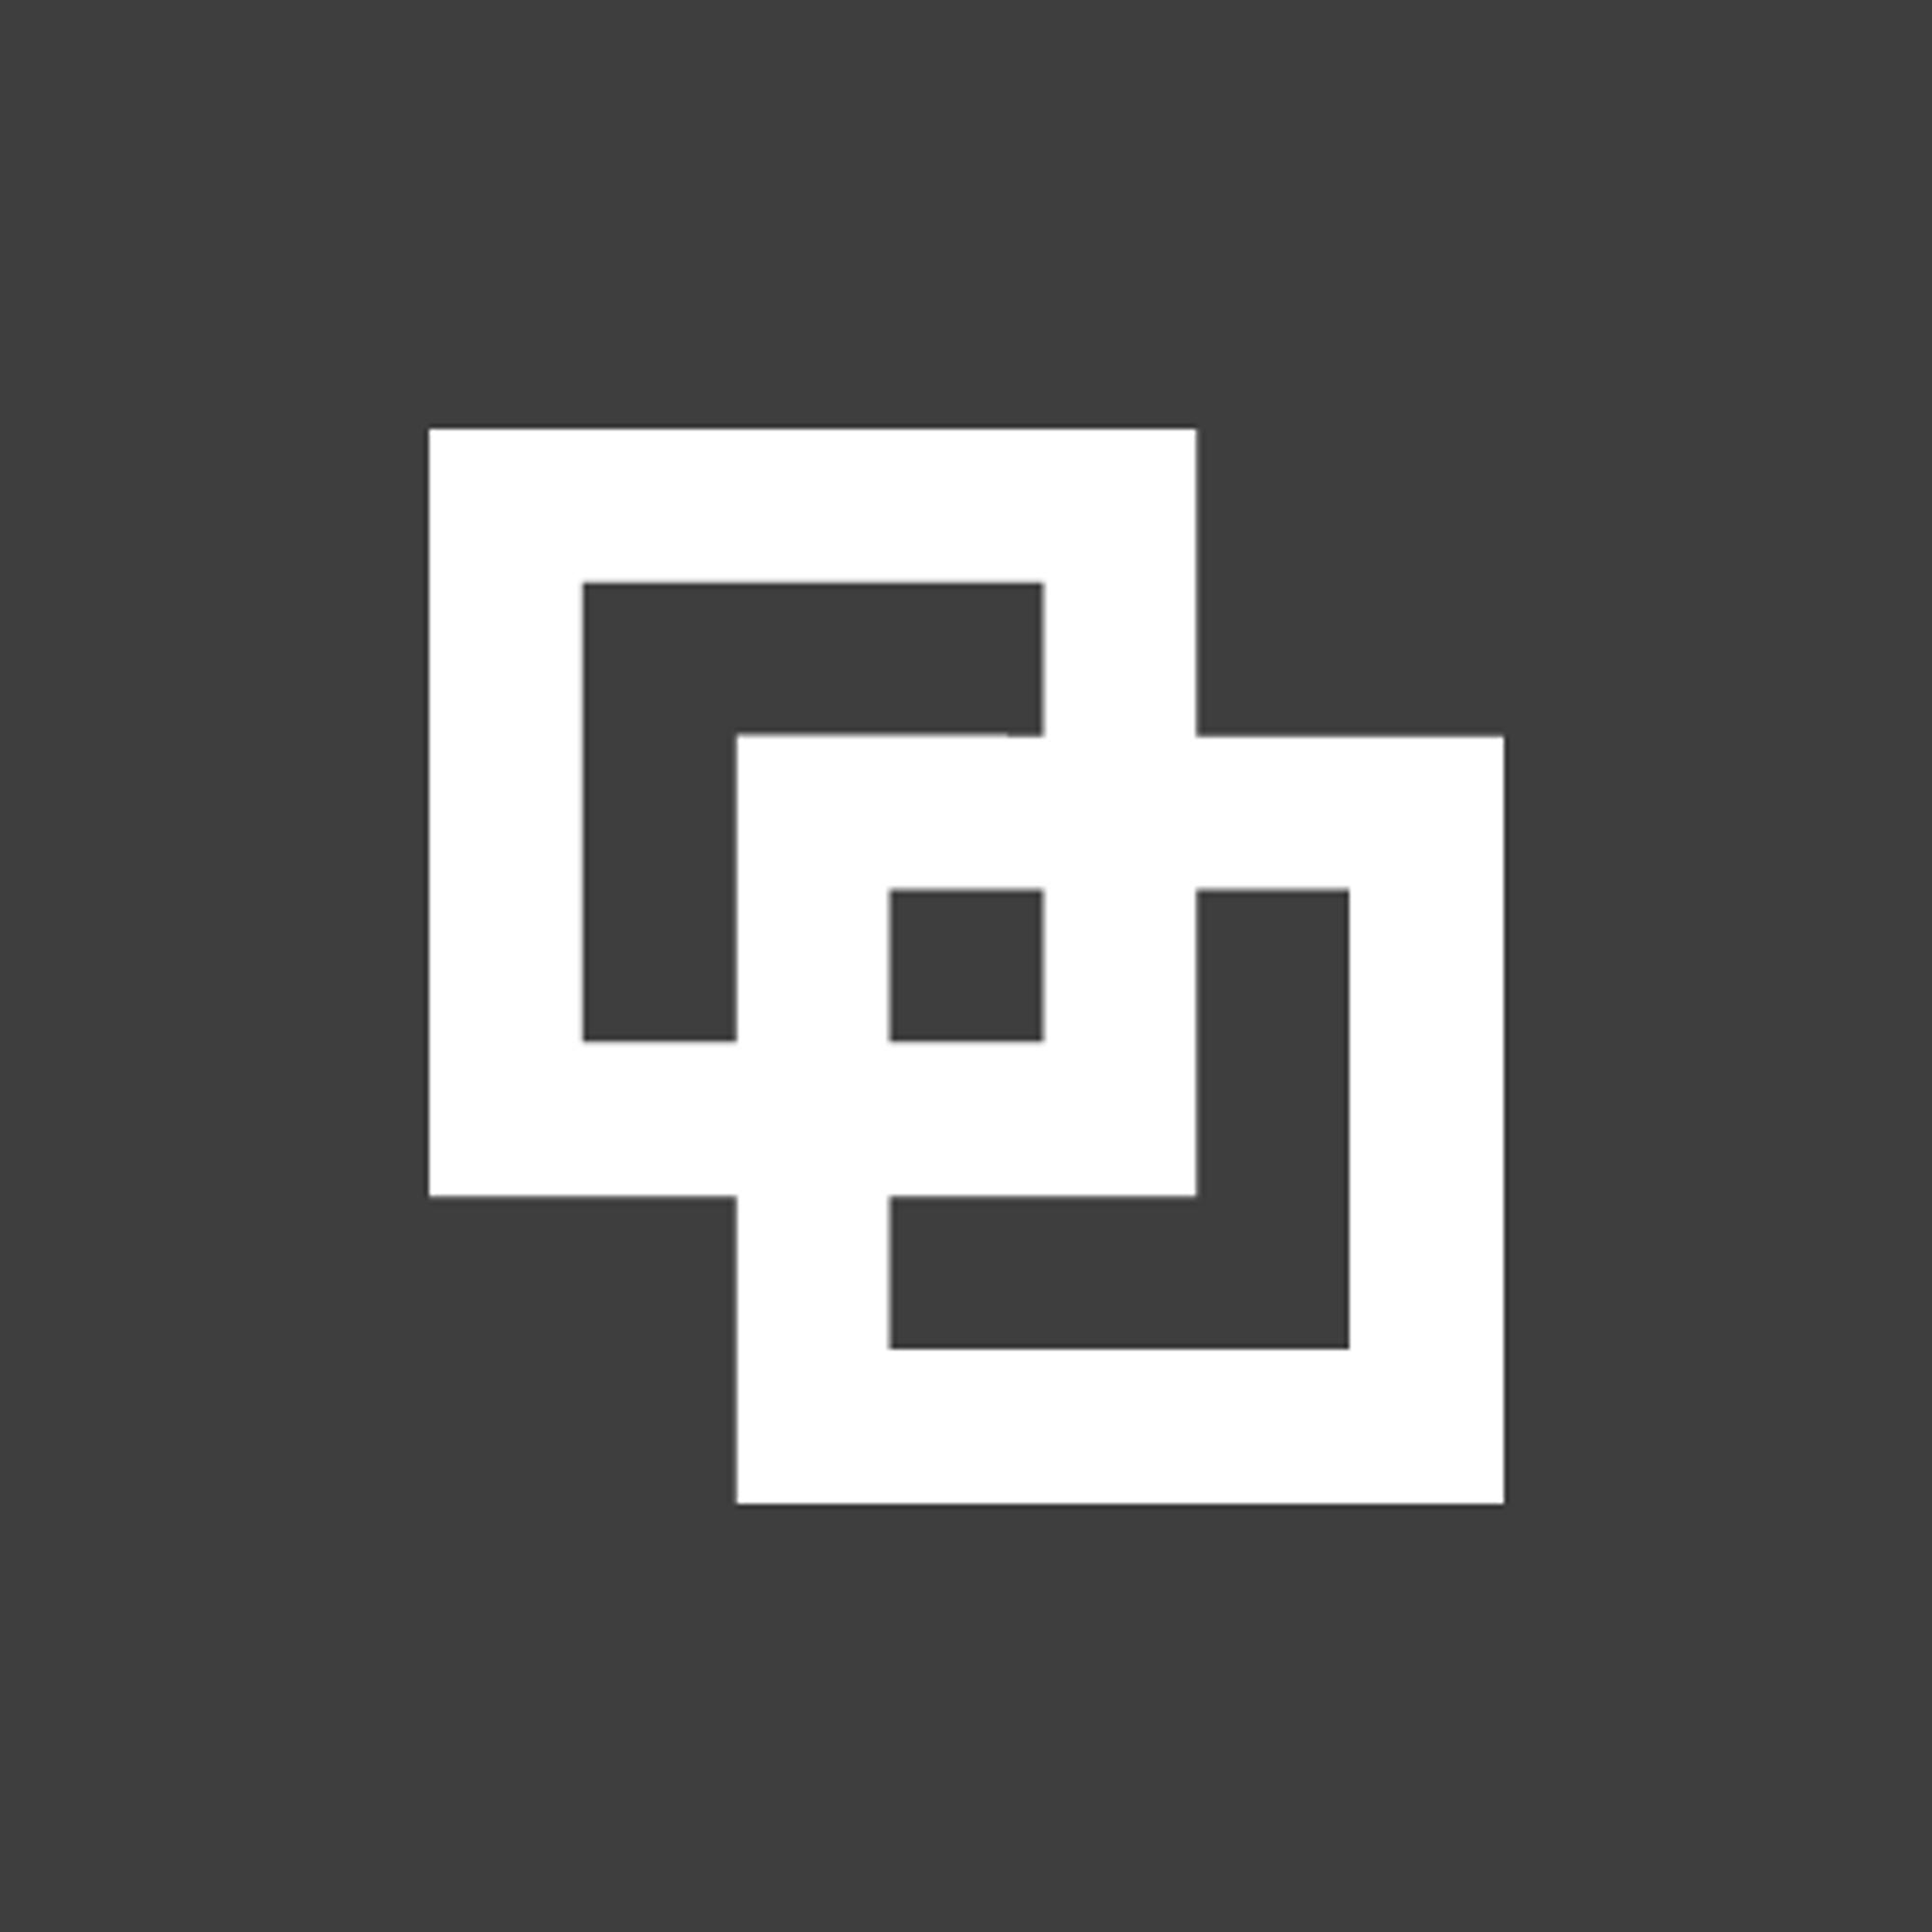 mAy-I_symbol_bg_black.png